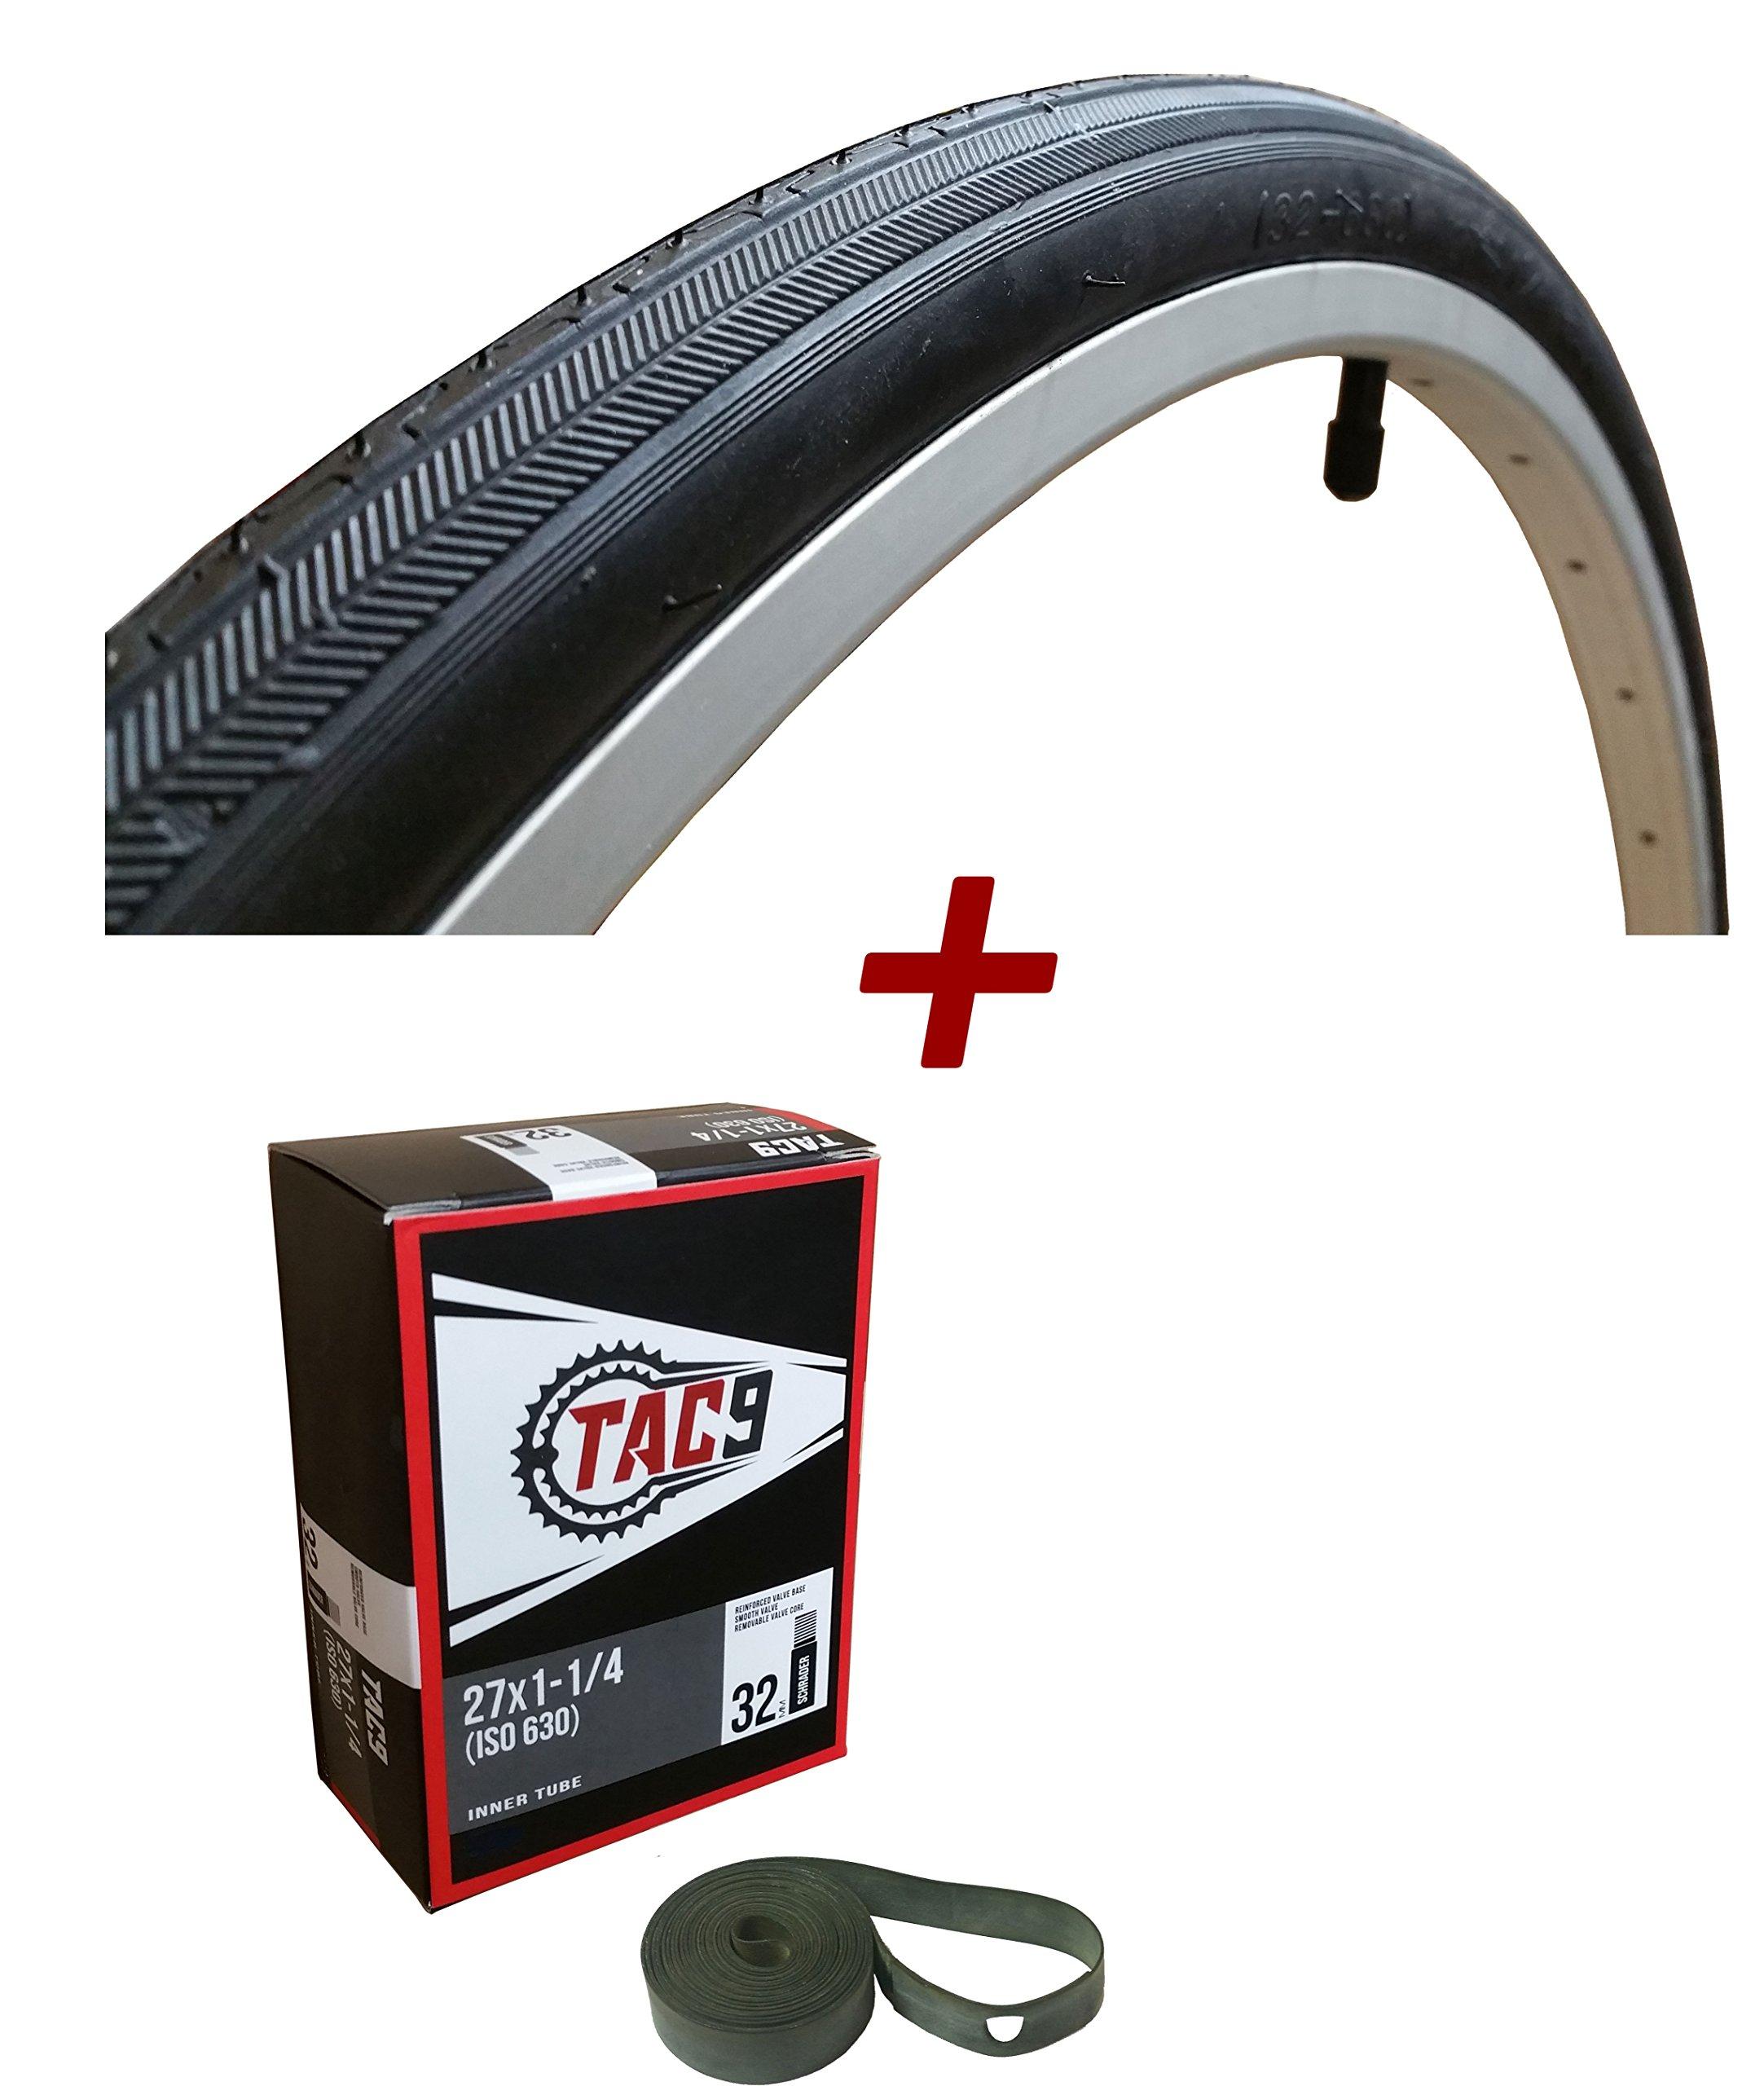 TAC 9 - 27x1-1/4 Bike Tire, Bonus Tube and Rim Strip - Select Gum Wall or Black Wall by TAC 9